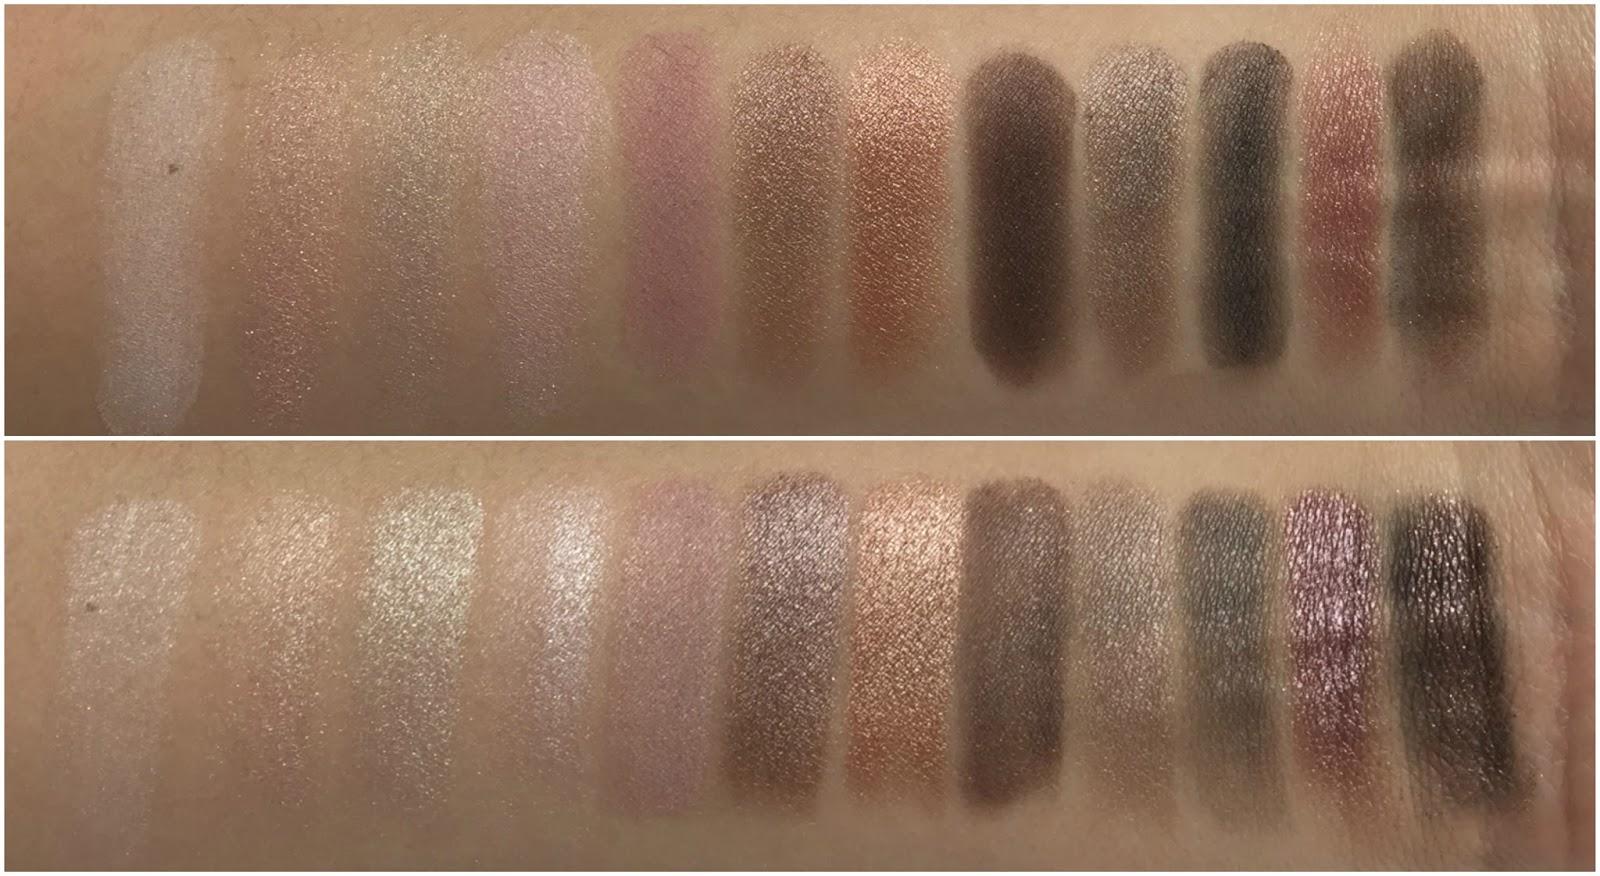 Mars Forever Nude Makeup Kit Including Eyeshadow, Blush, Highlighter Lip Color Palette